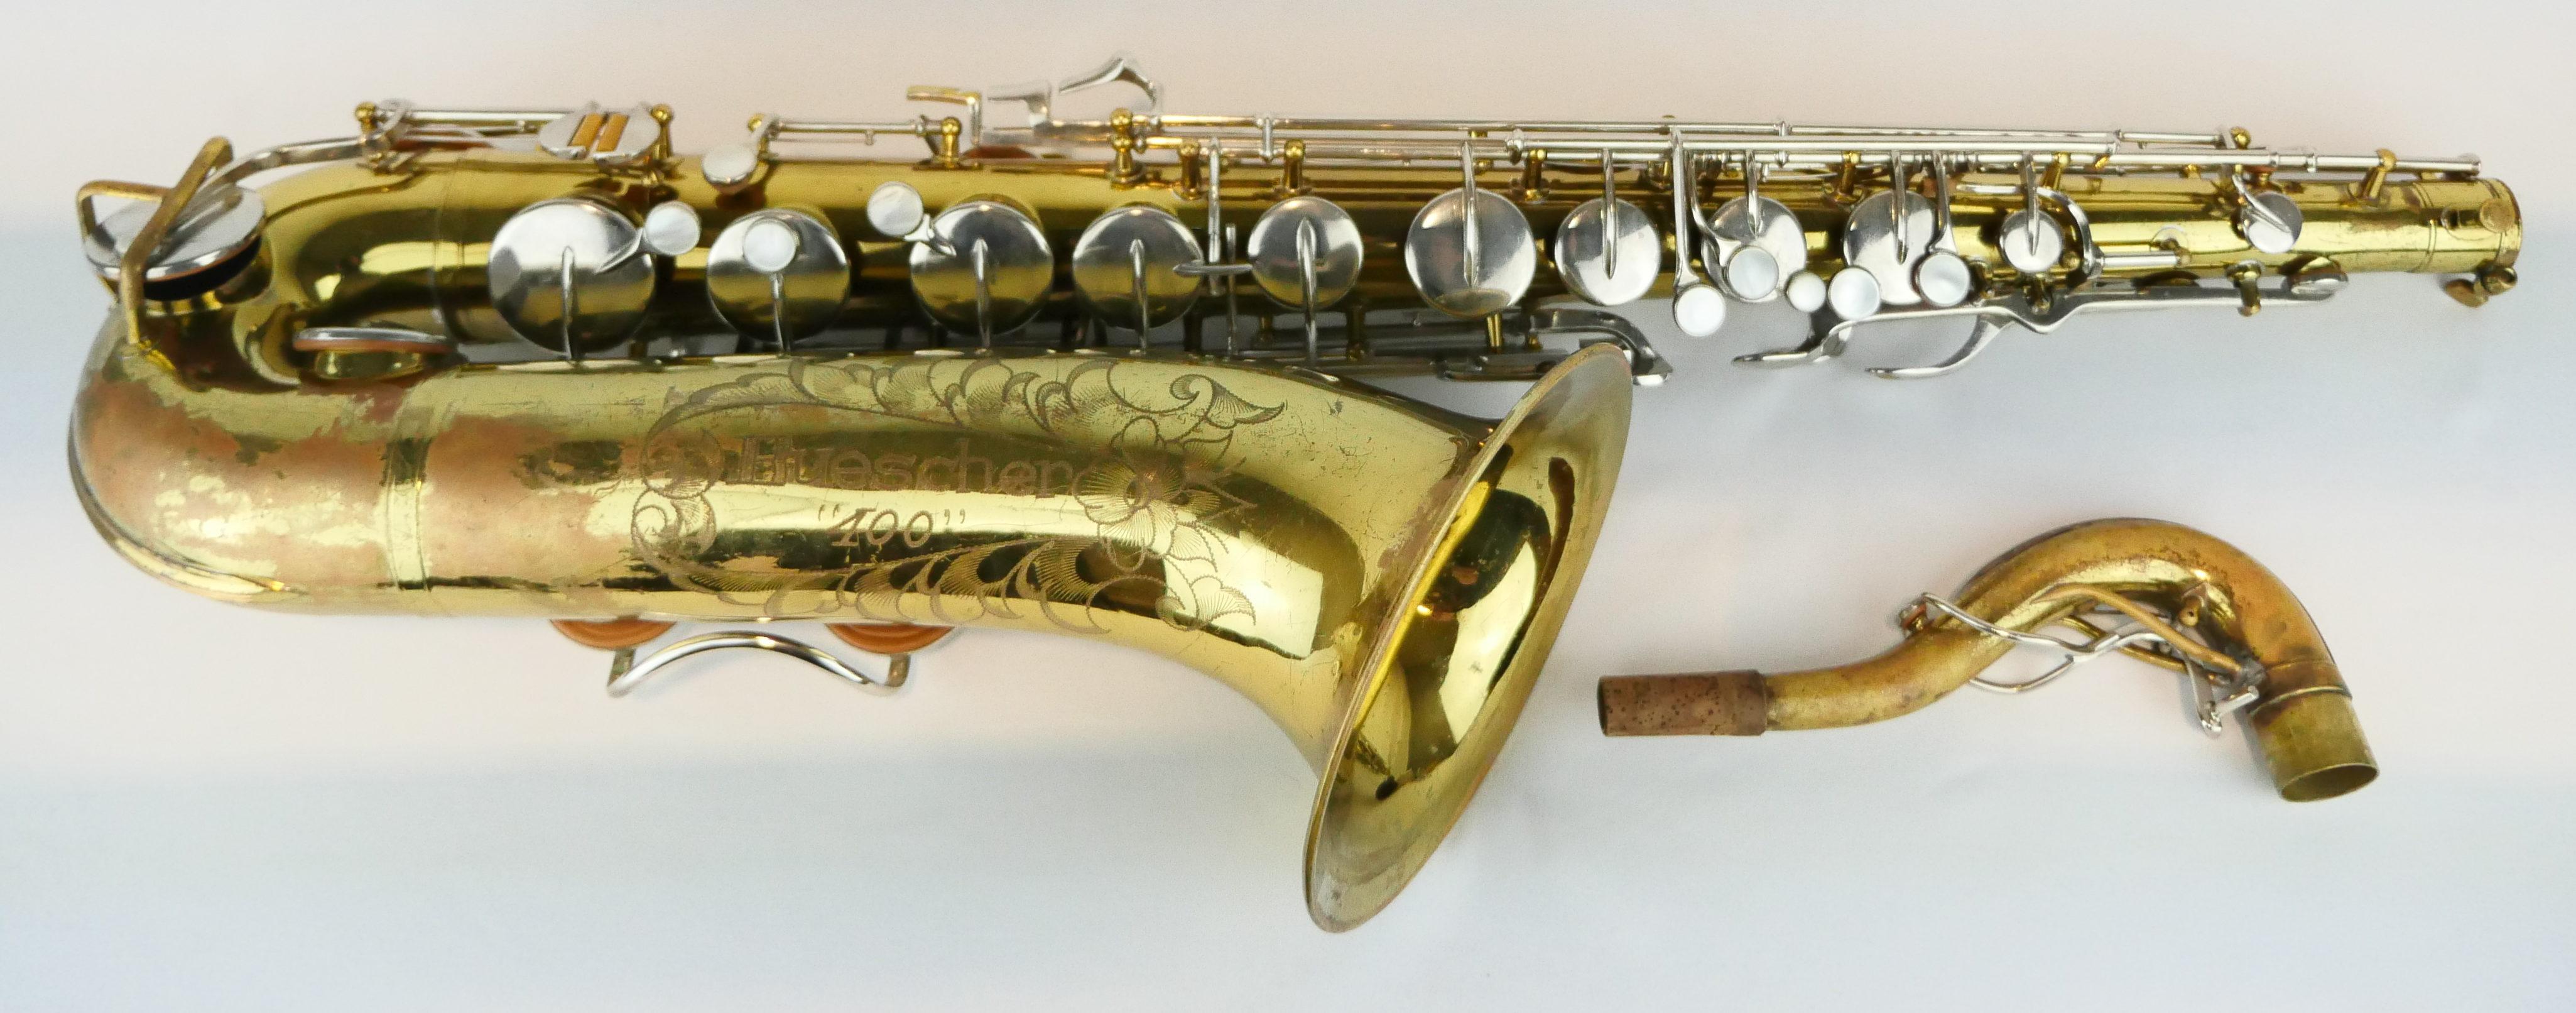 Amazing Used Buescher 400 Tenor Saxophone S523 Download Free Architecture Designs Intelgarnamadebymaigaardcom